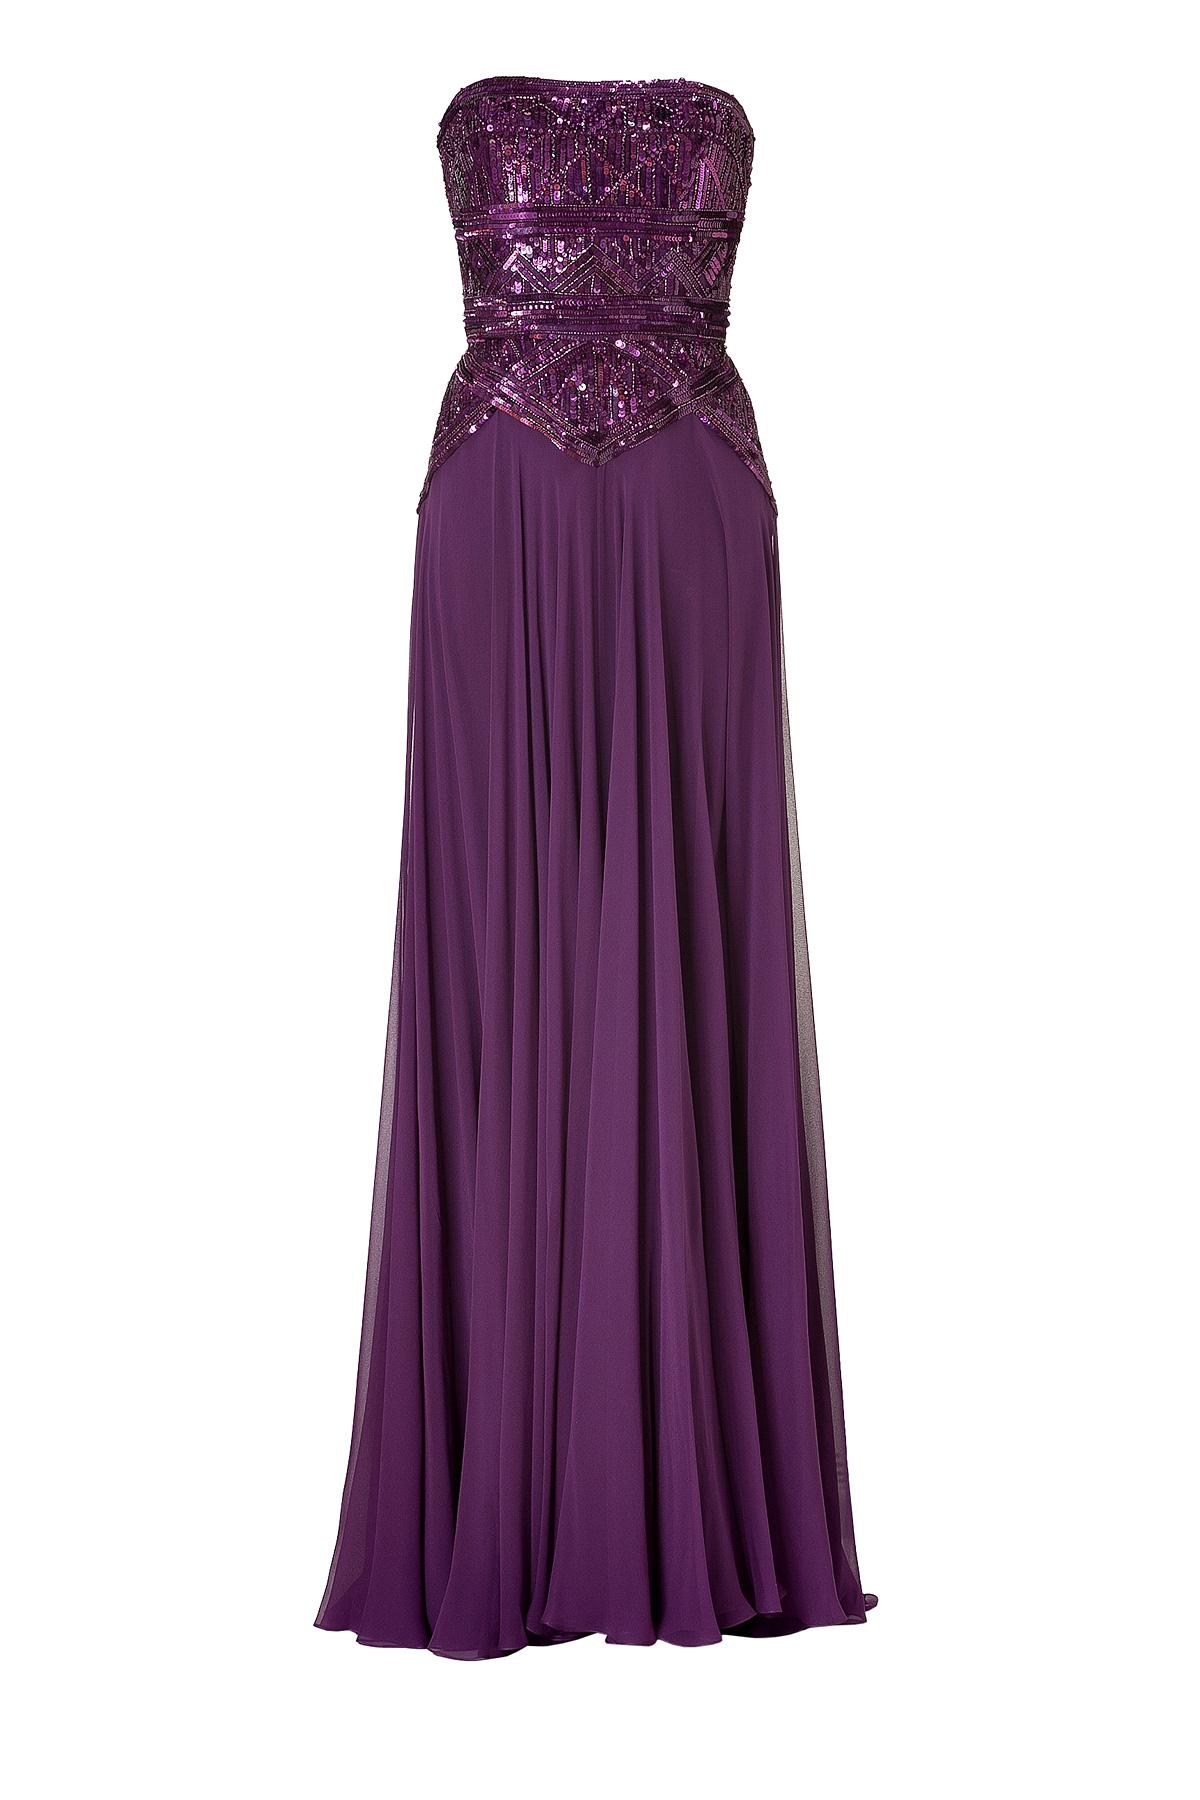 Fabulous Bridesmaids Dresses in Pantone\'s Fall 2013 Fashion Colours ...